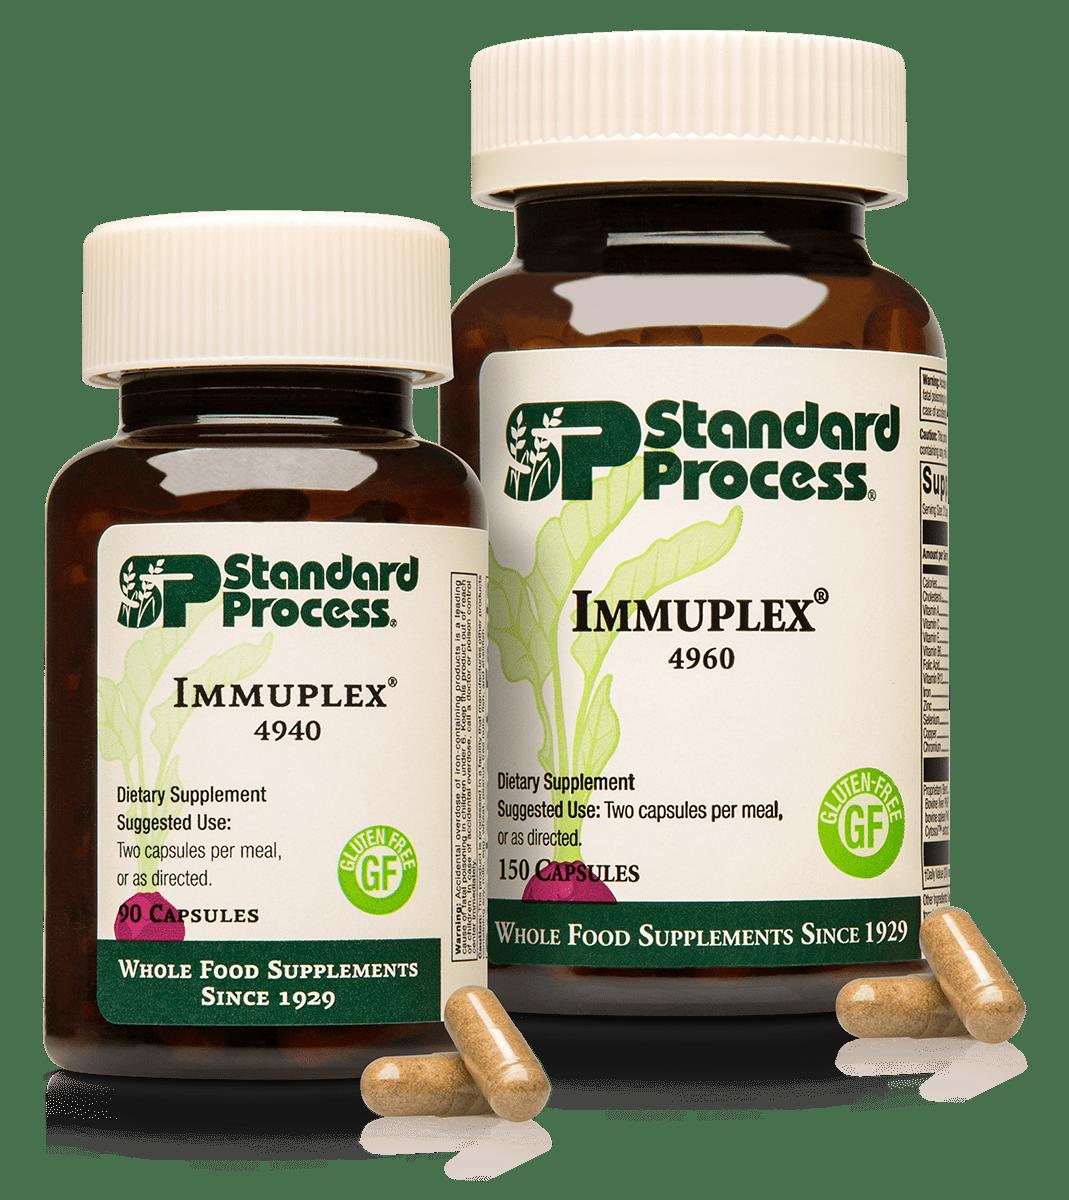 Immuplex®